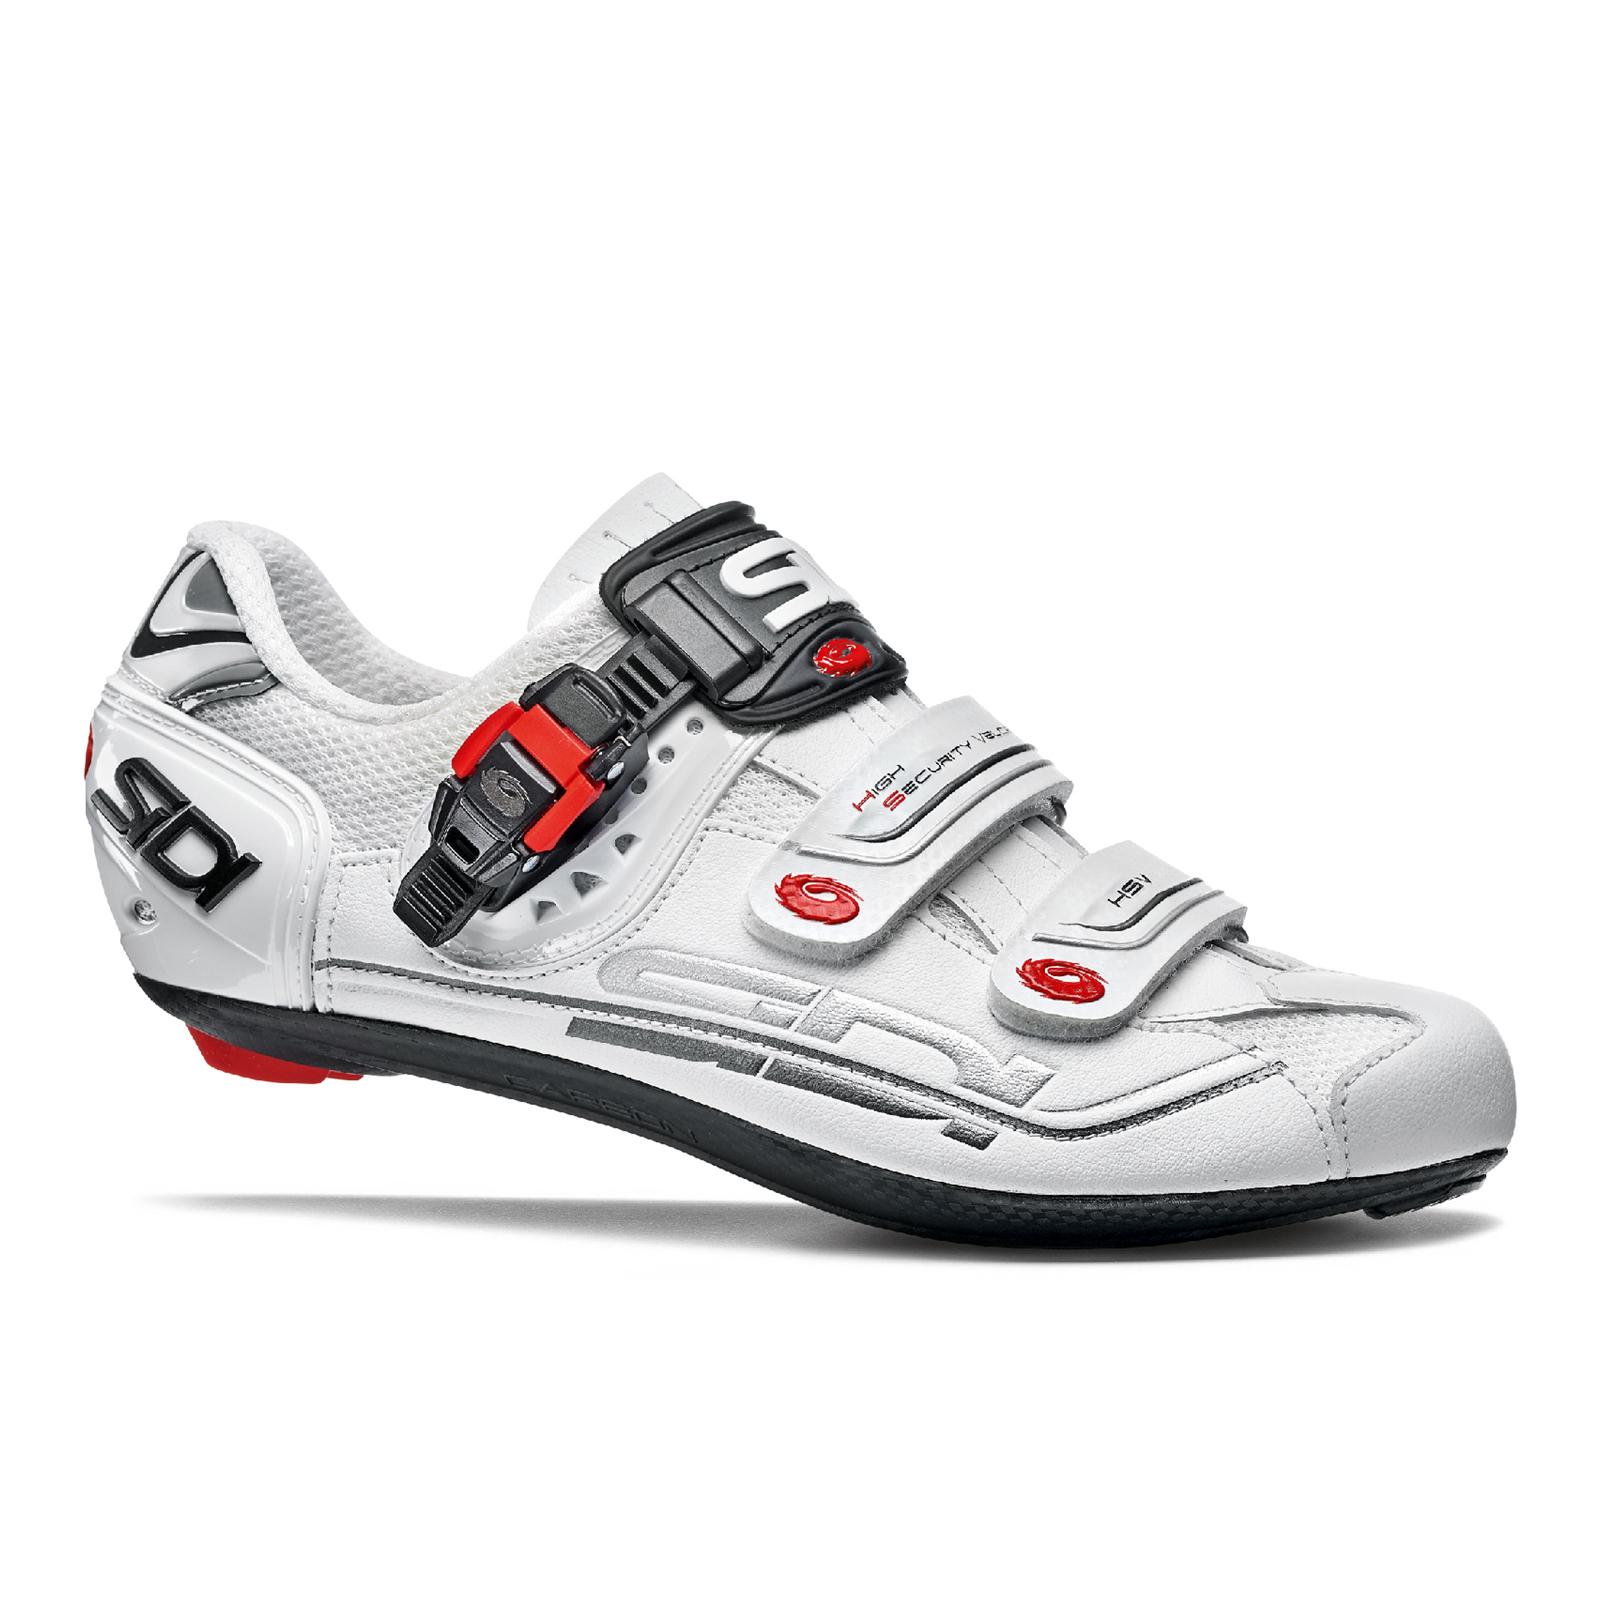 Sidi Cycling Shoes Half Size